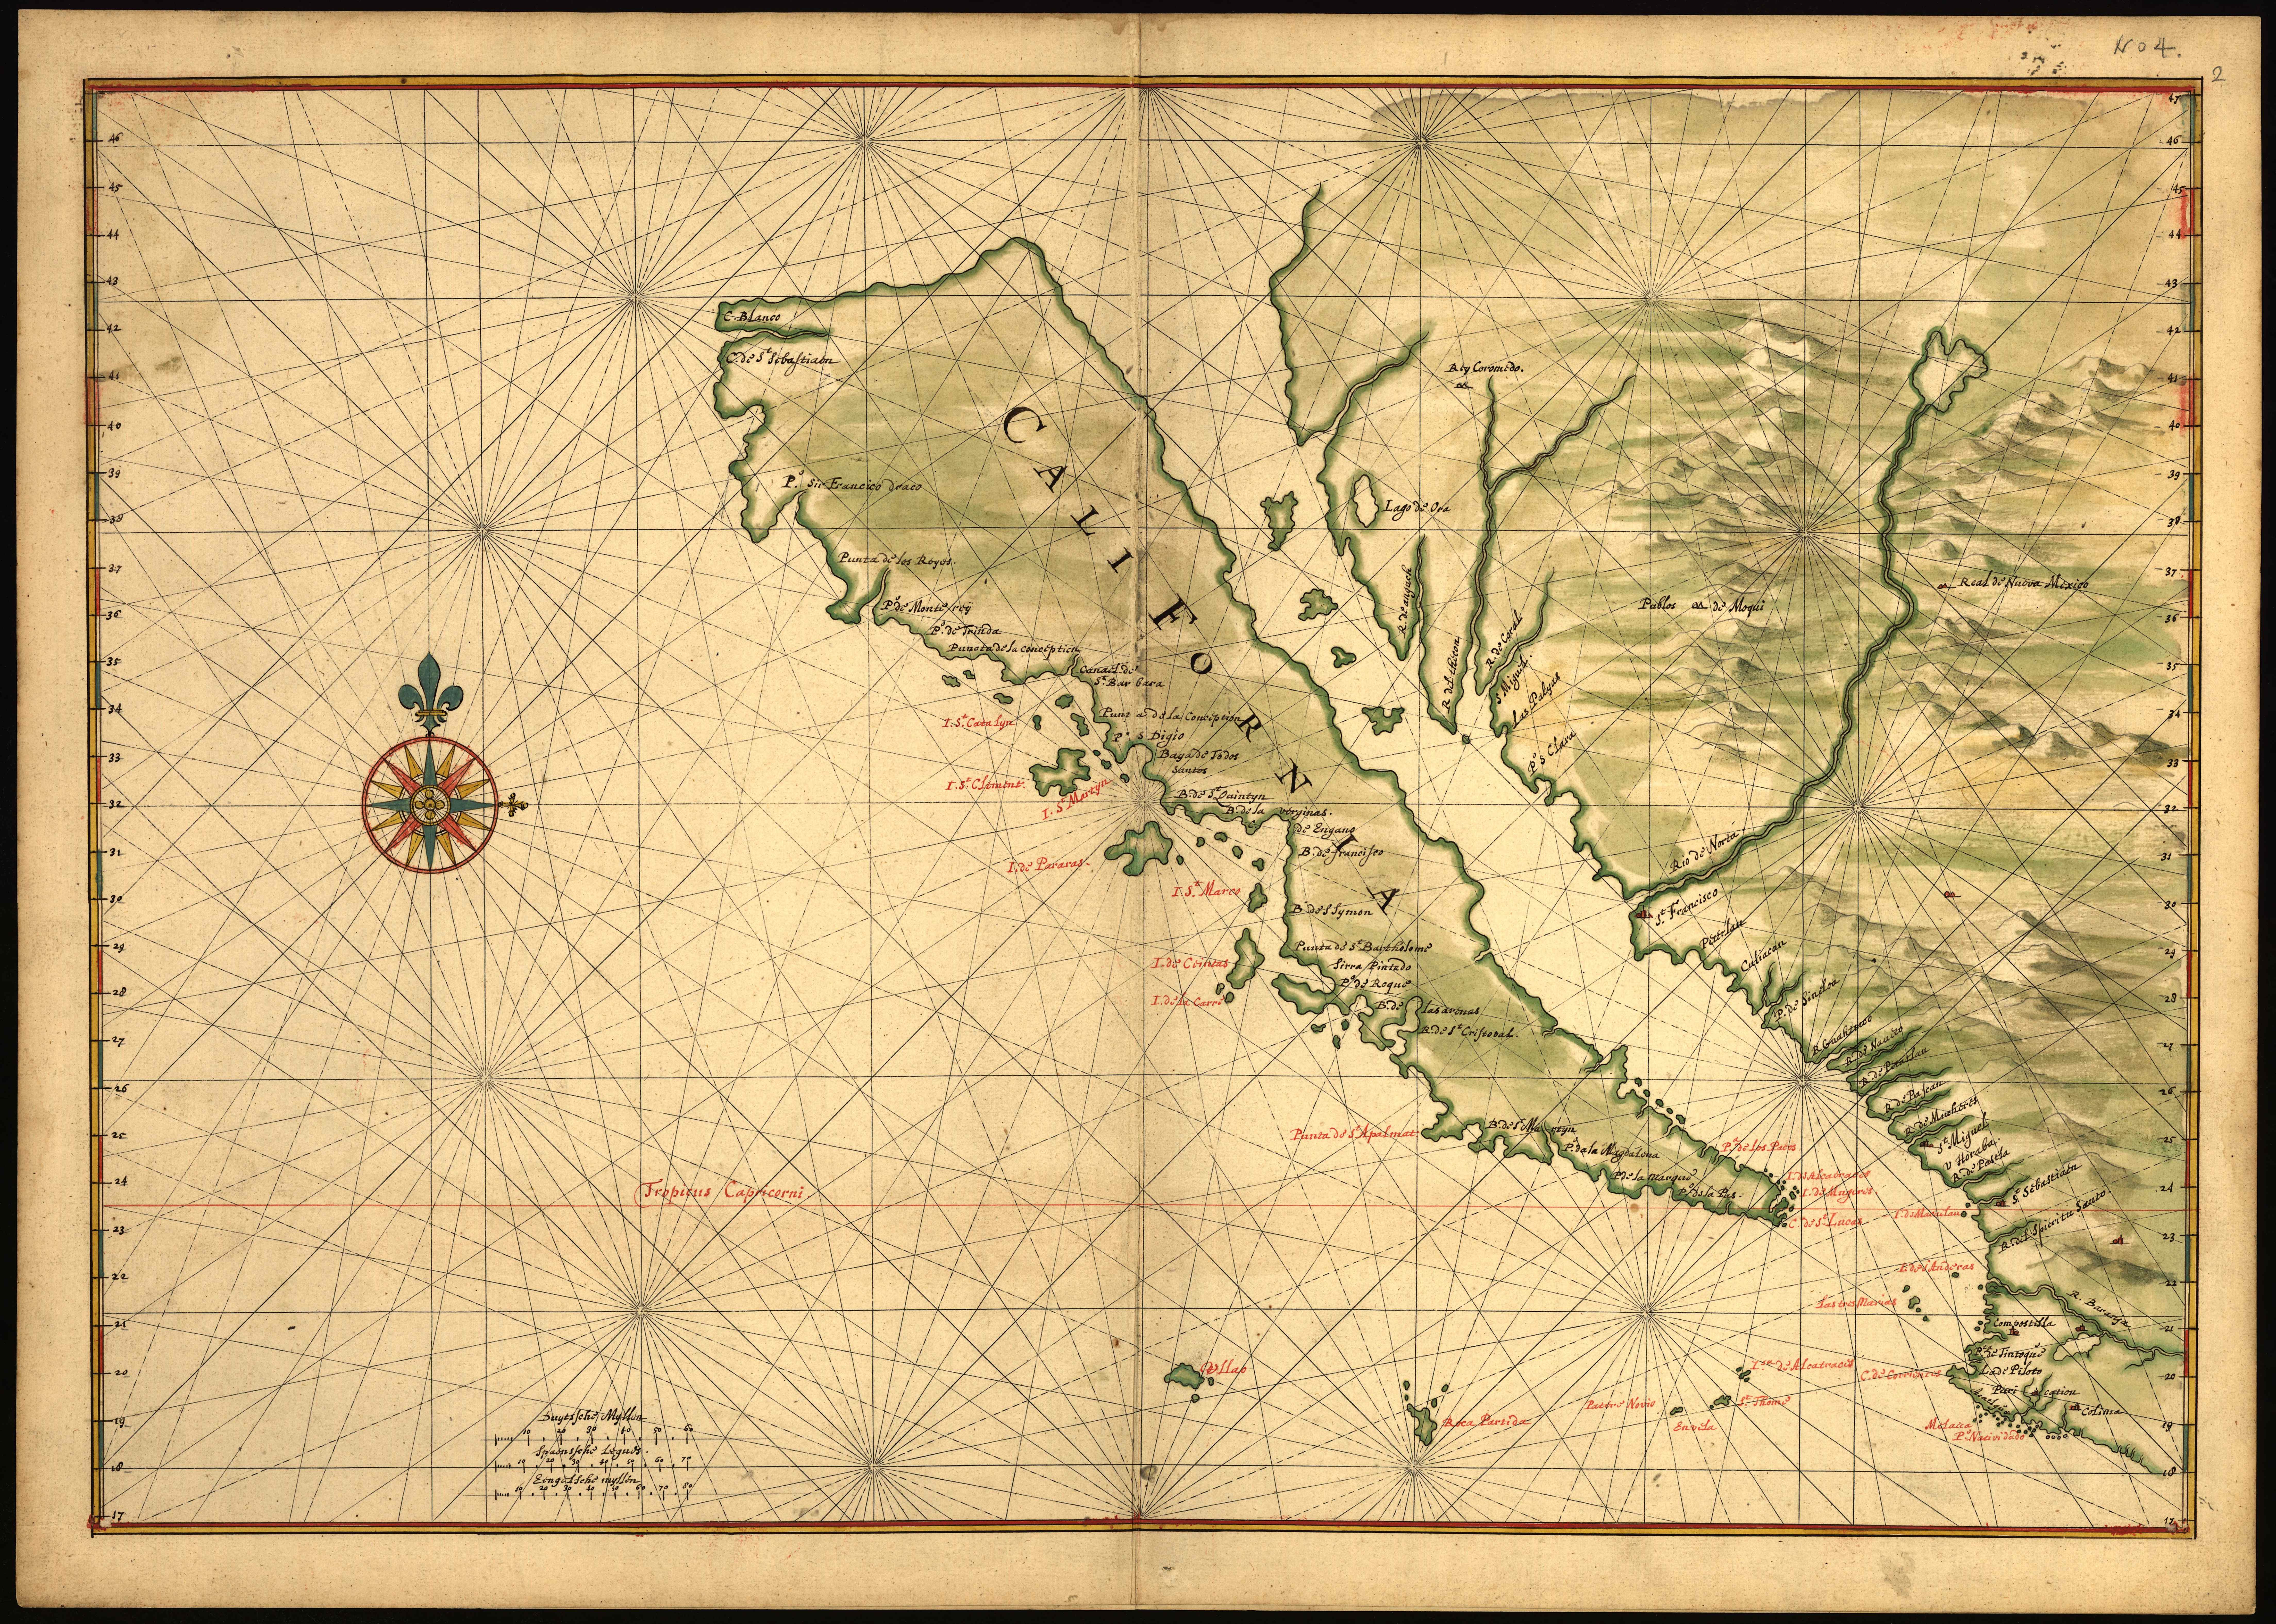 FileIsland Of Californiajpg Wikimedia Commons - Mapa de california